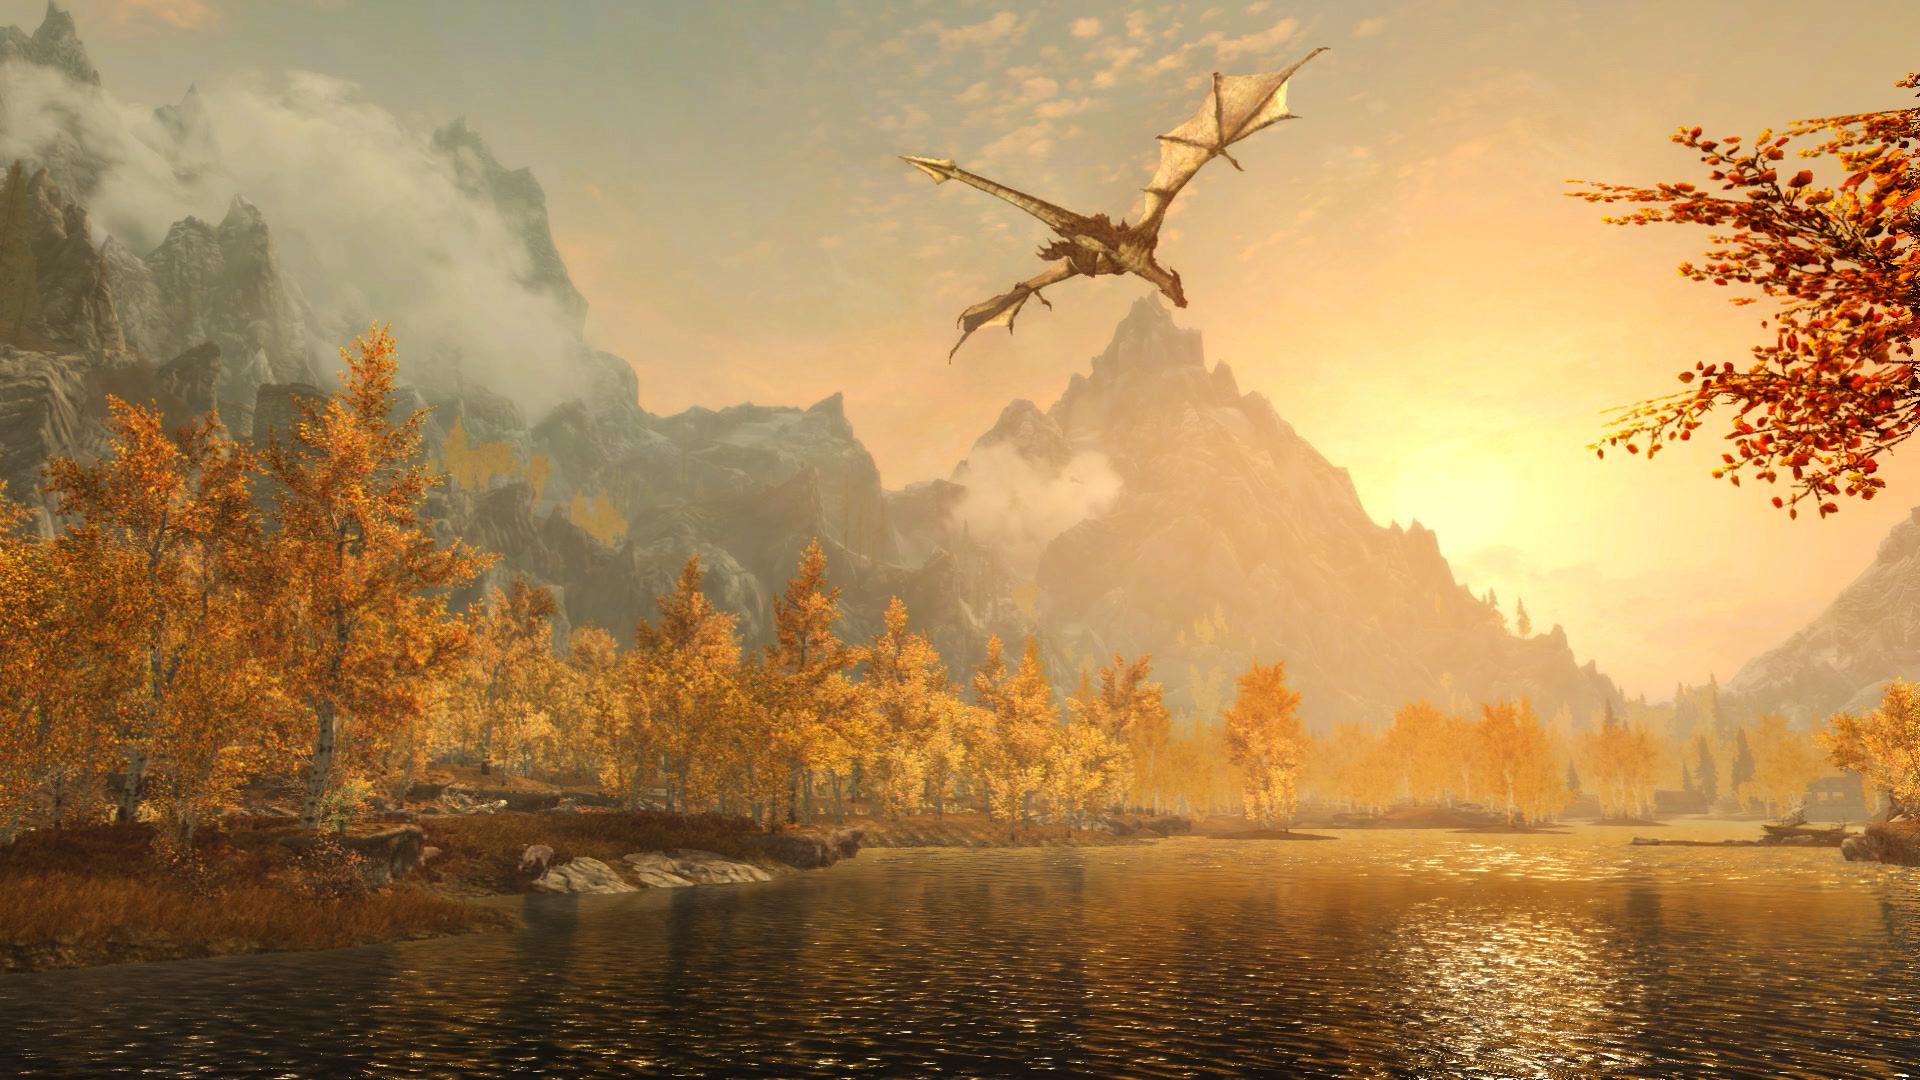 The Elder Scrolls Online Tamriel Unlimited Details   LaunchBox 1920x1080